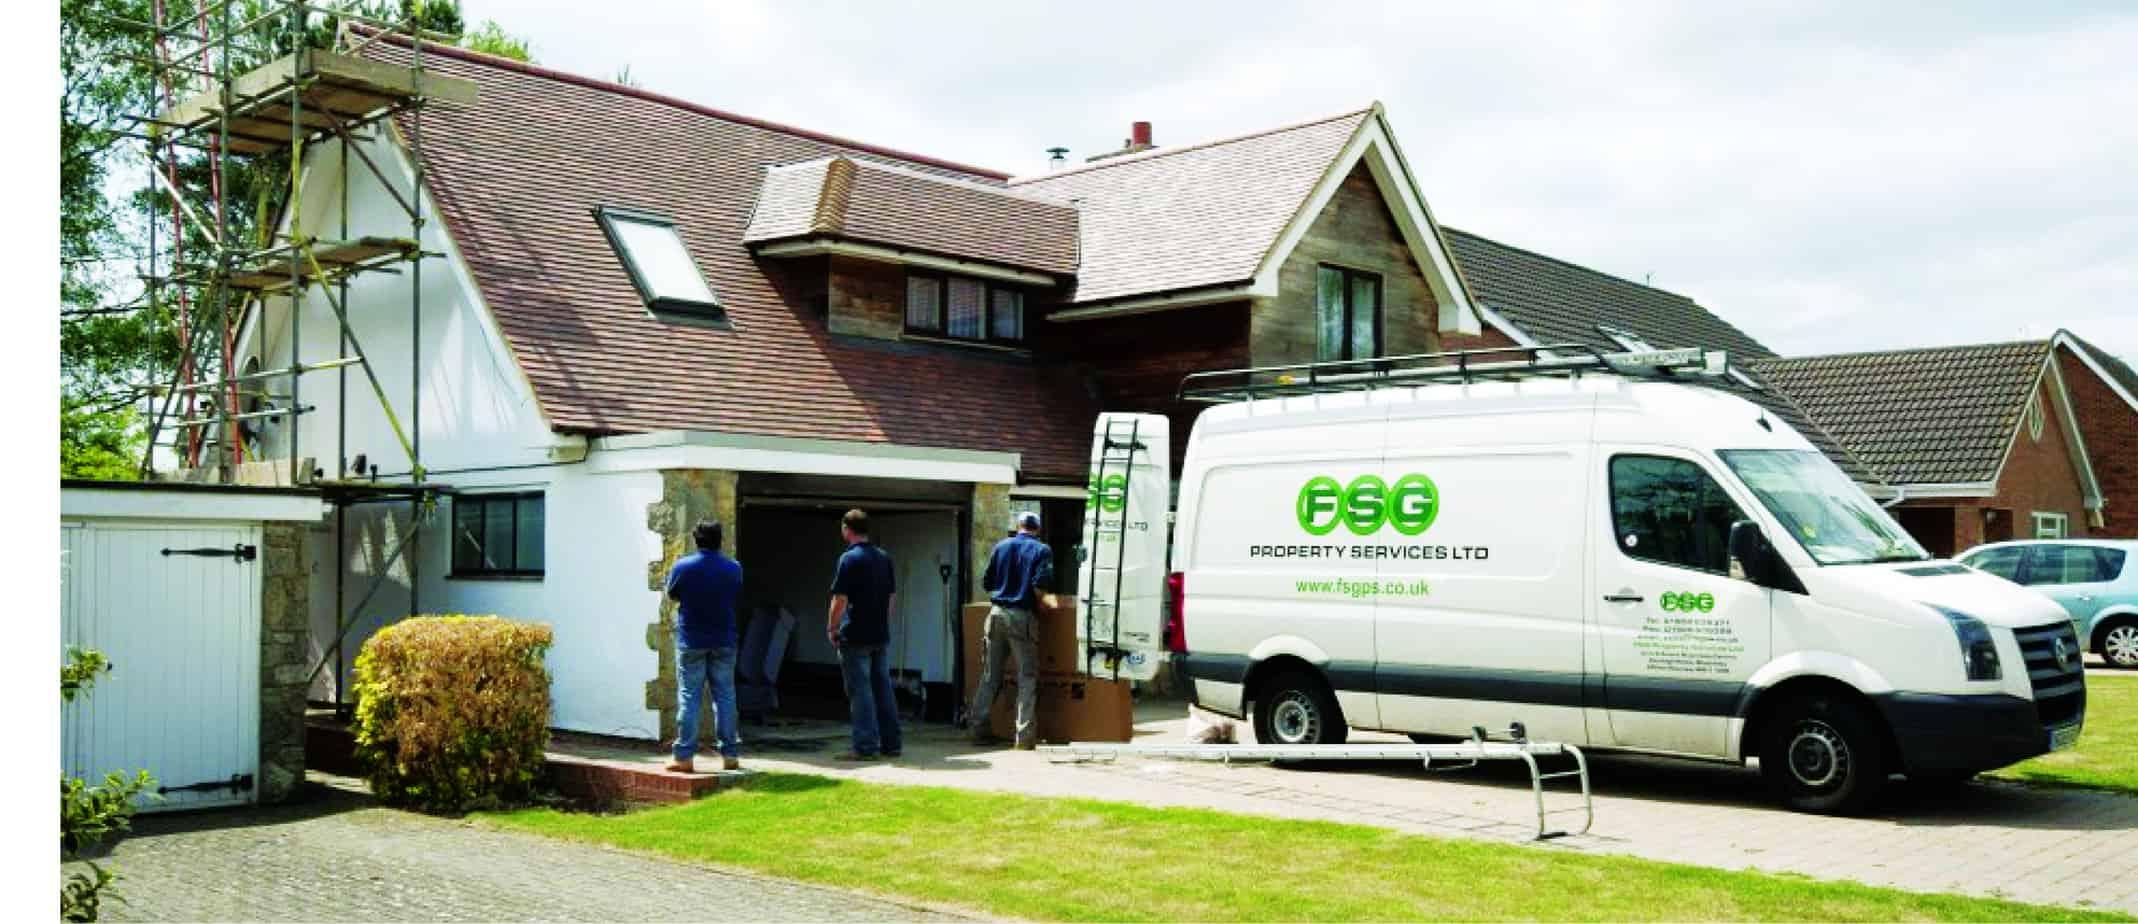 Fsg Property Maintenance Brand Magic